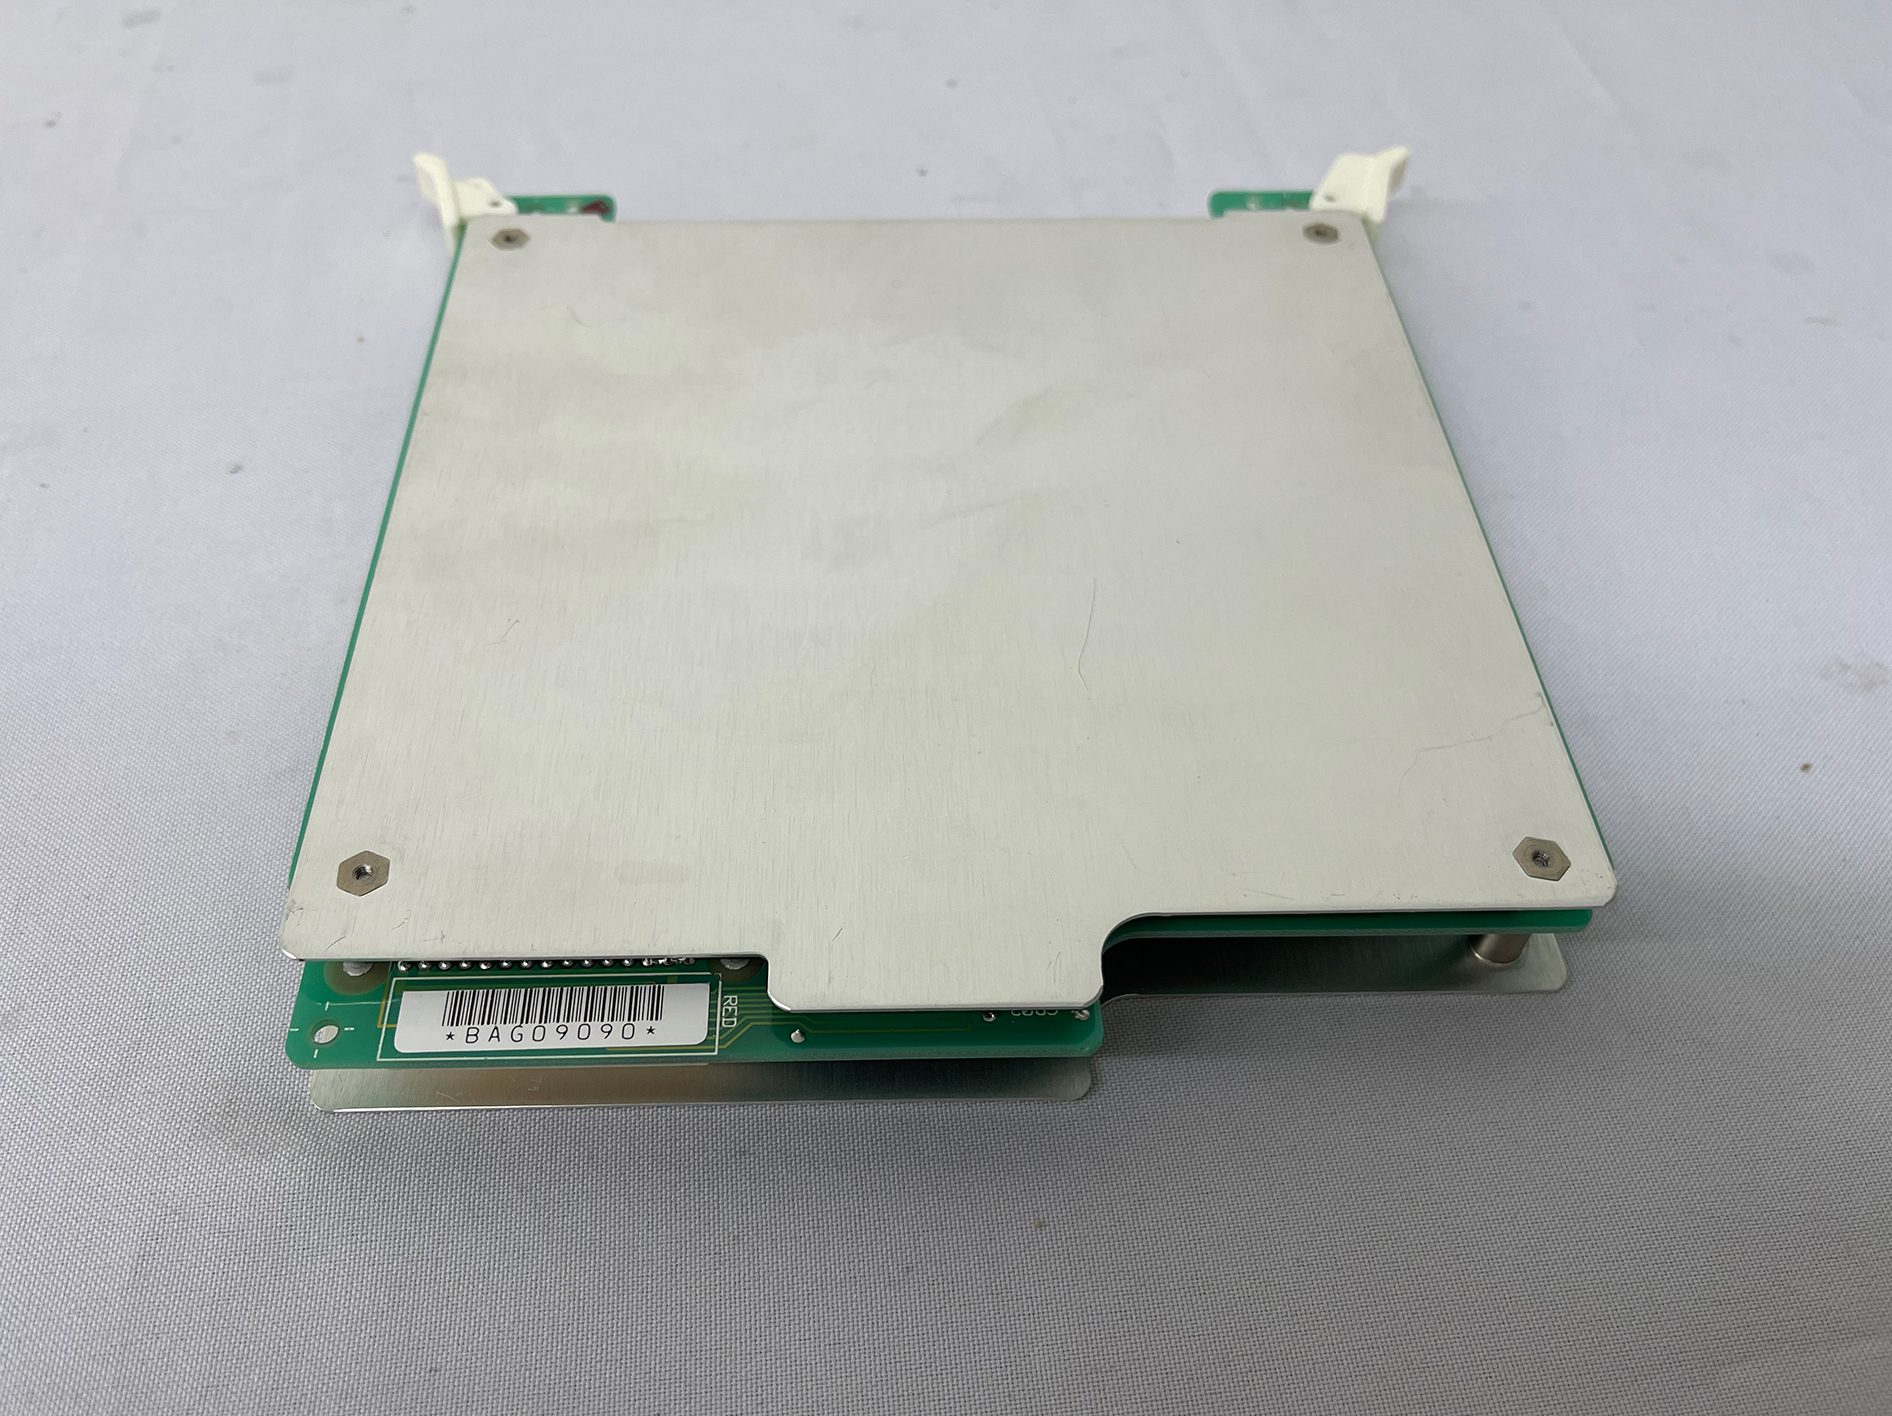 Buy Agilent-44470 A -66501-Relay Multiplexer-59994 Online